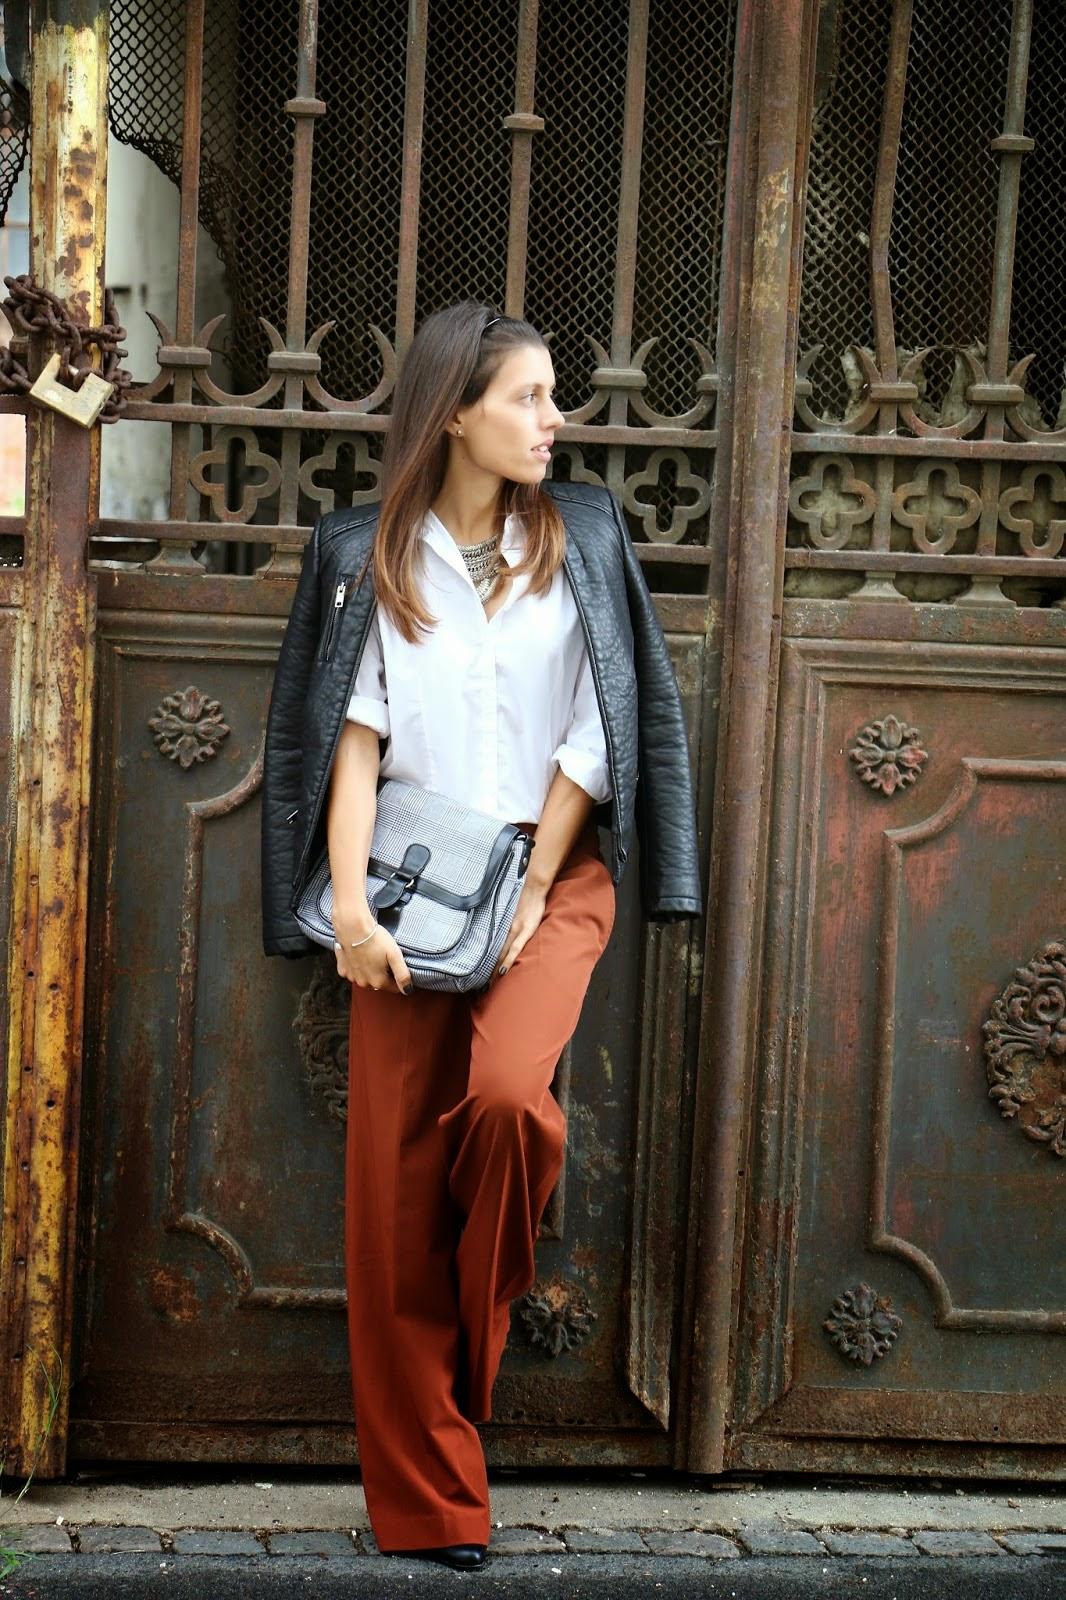 http://ilovefitametrica.blogspot.pt/2014/10/palazzo-pants.html